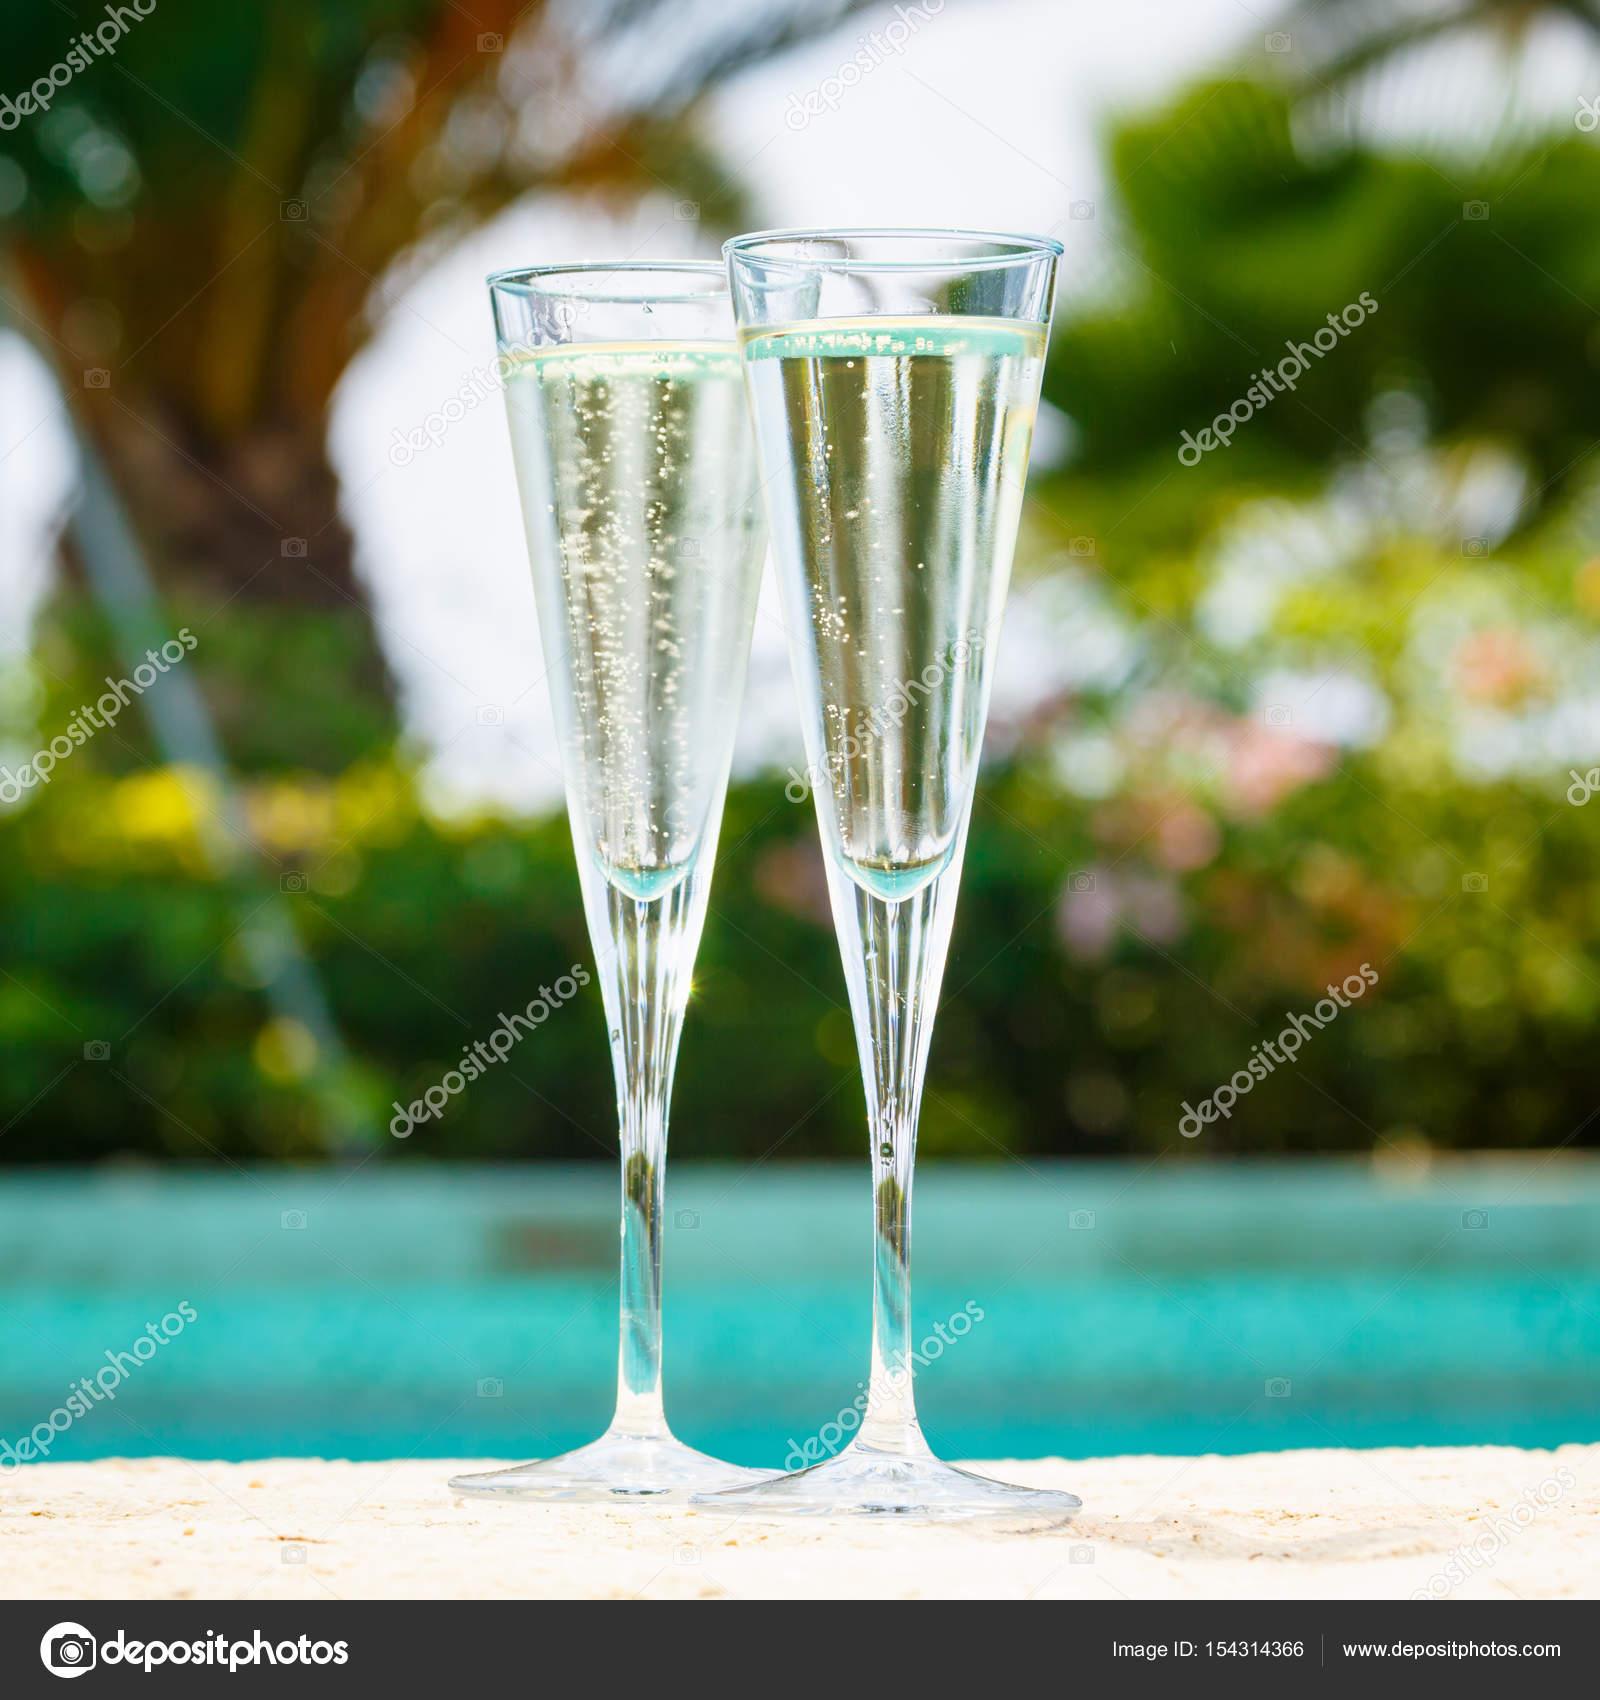 Pool Konzept zwei gläser prosecco am rande des resort pool konzept stockfoto